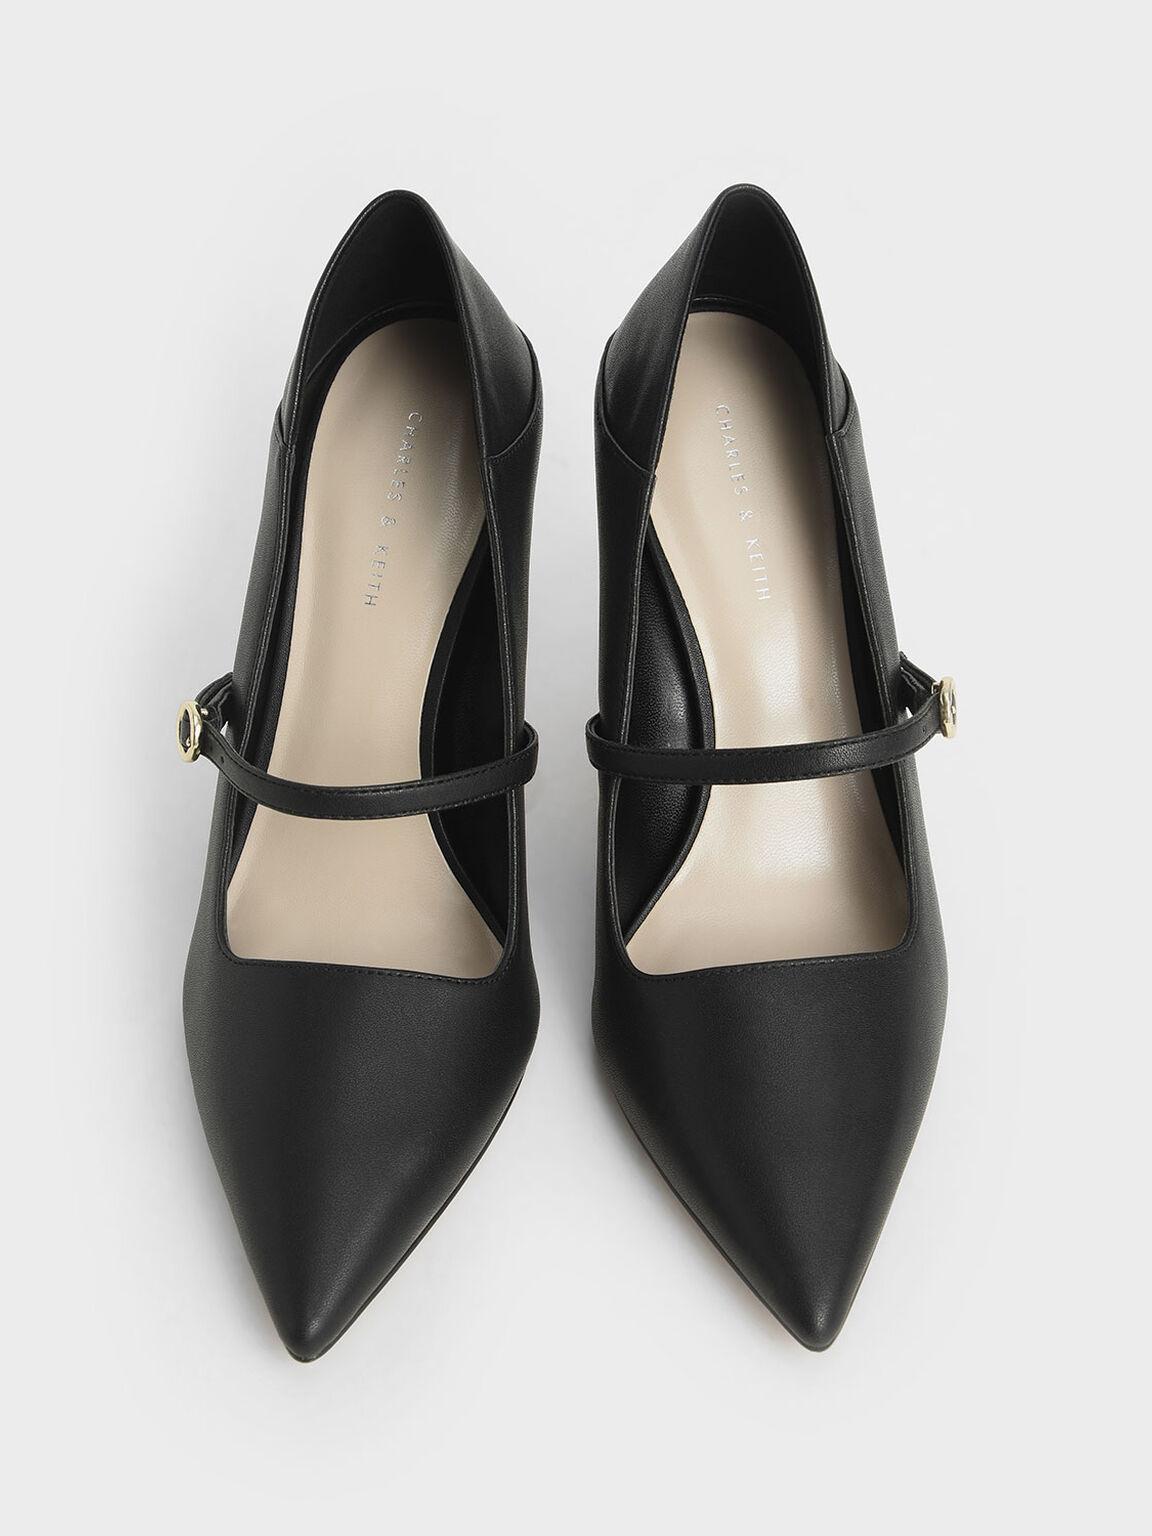 Mary Jane Stiletto Court Shoes, Black, hi-res